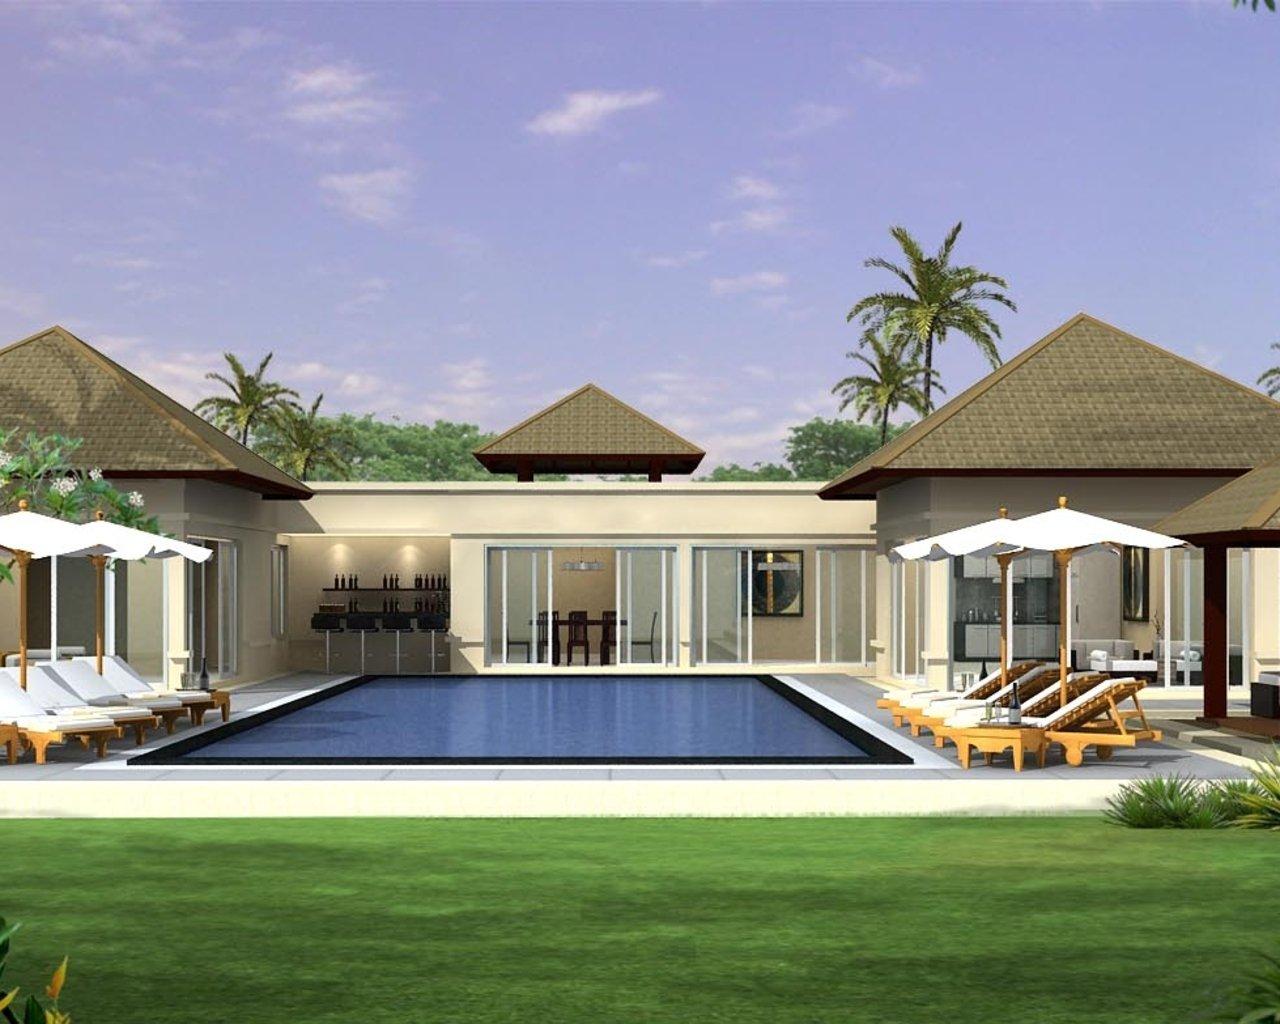 Architecture dubai modern hd widescreen 176640 wallpaper for 3d wallpaper for home dubai